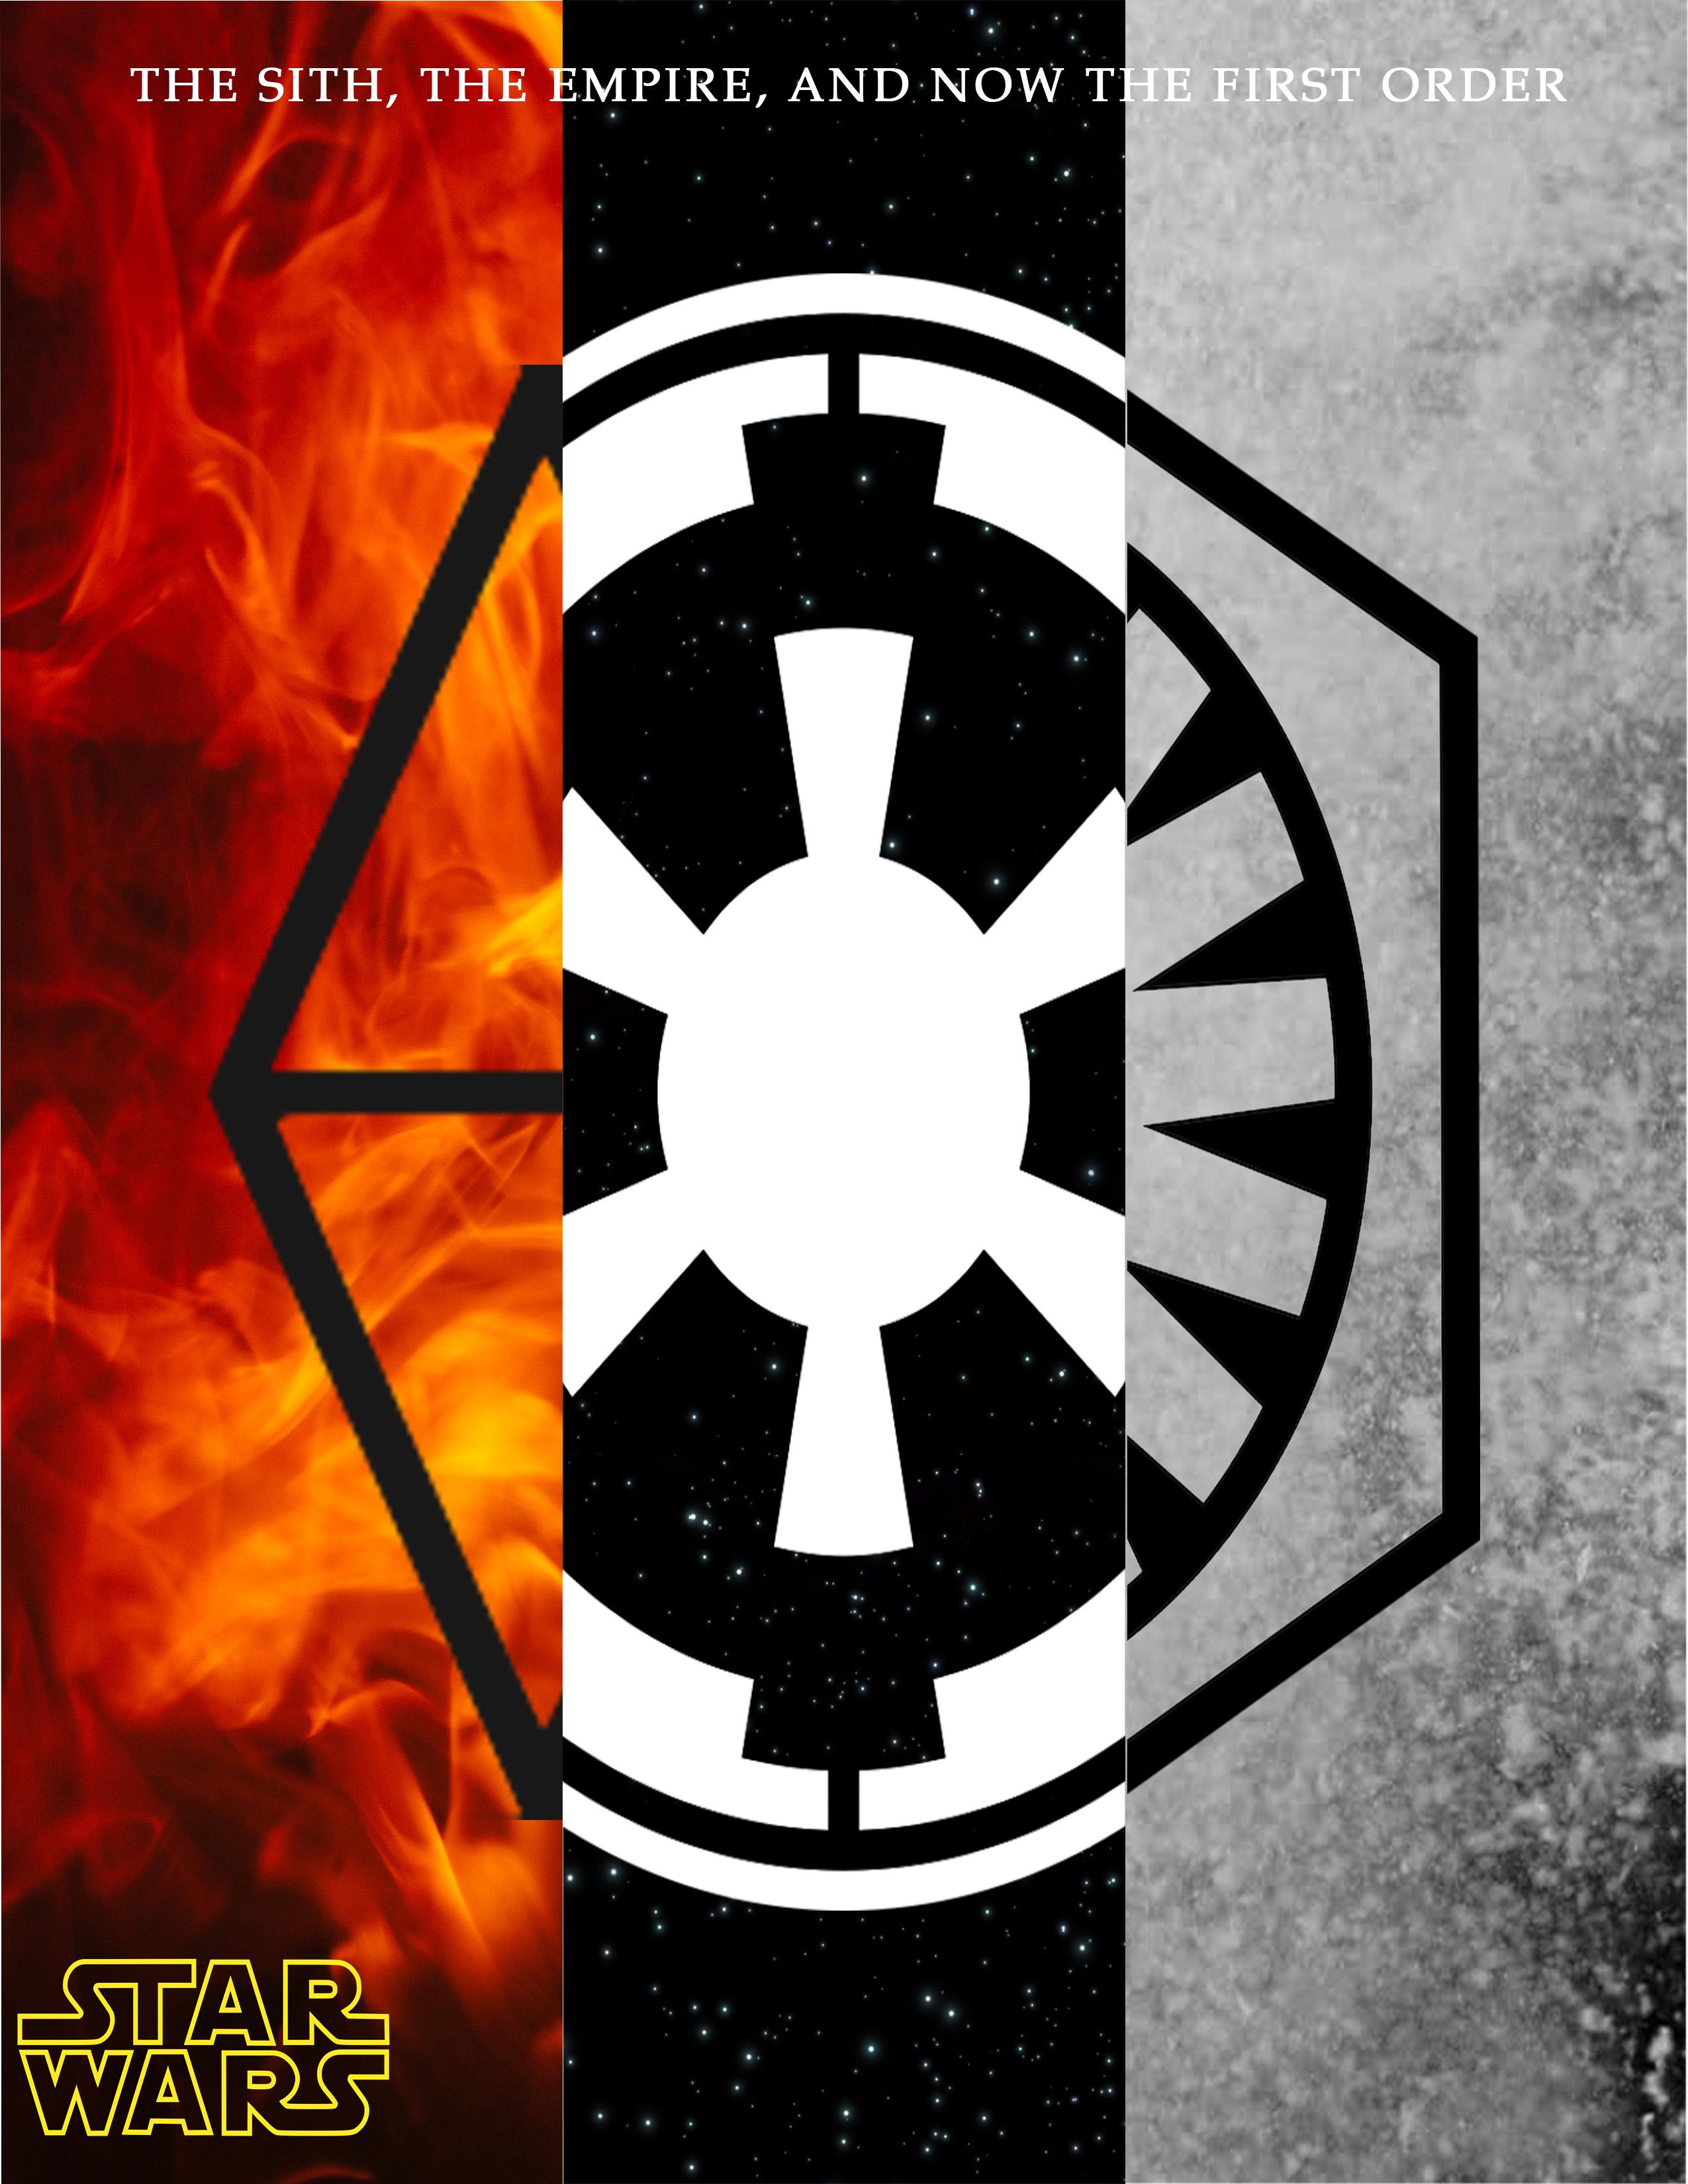 Star wars Poster copy